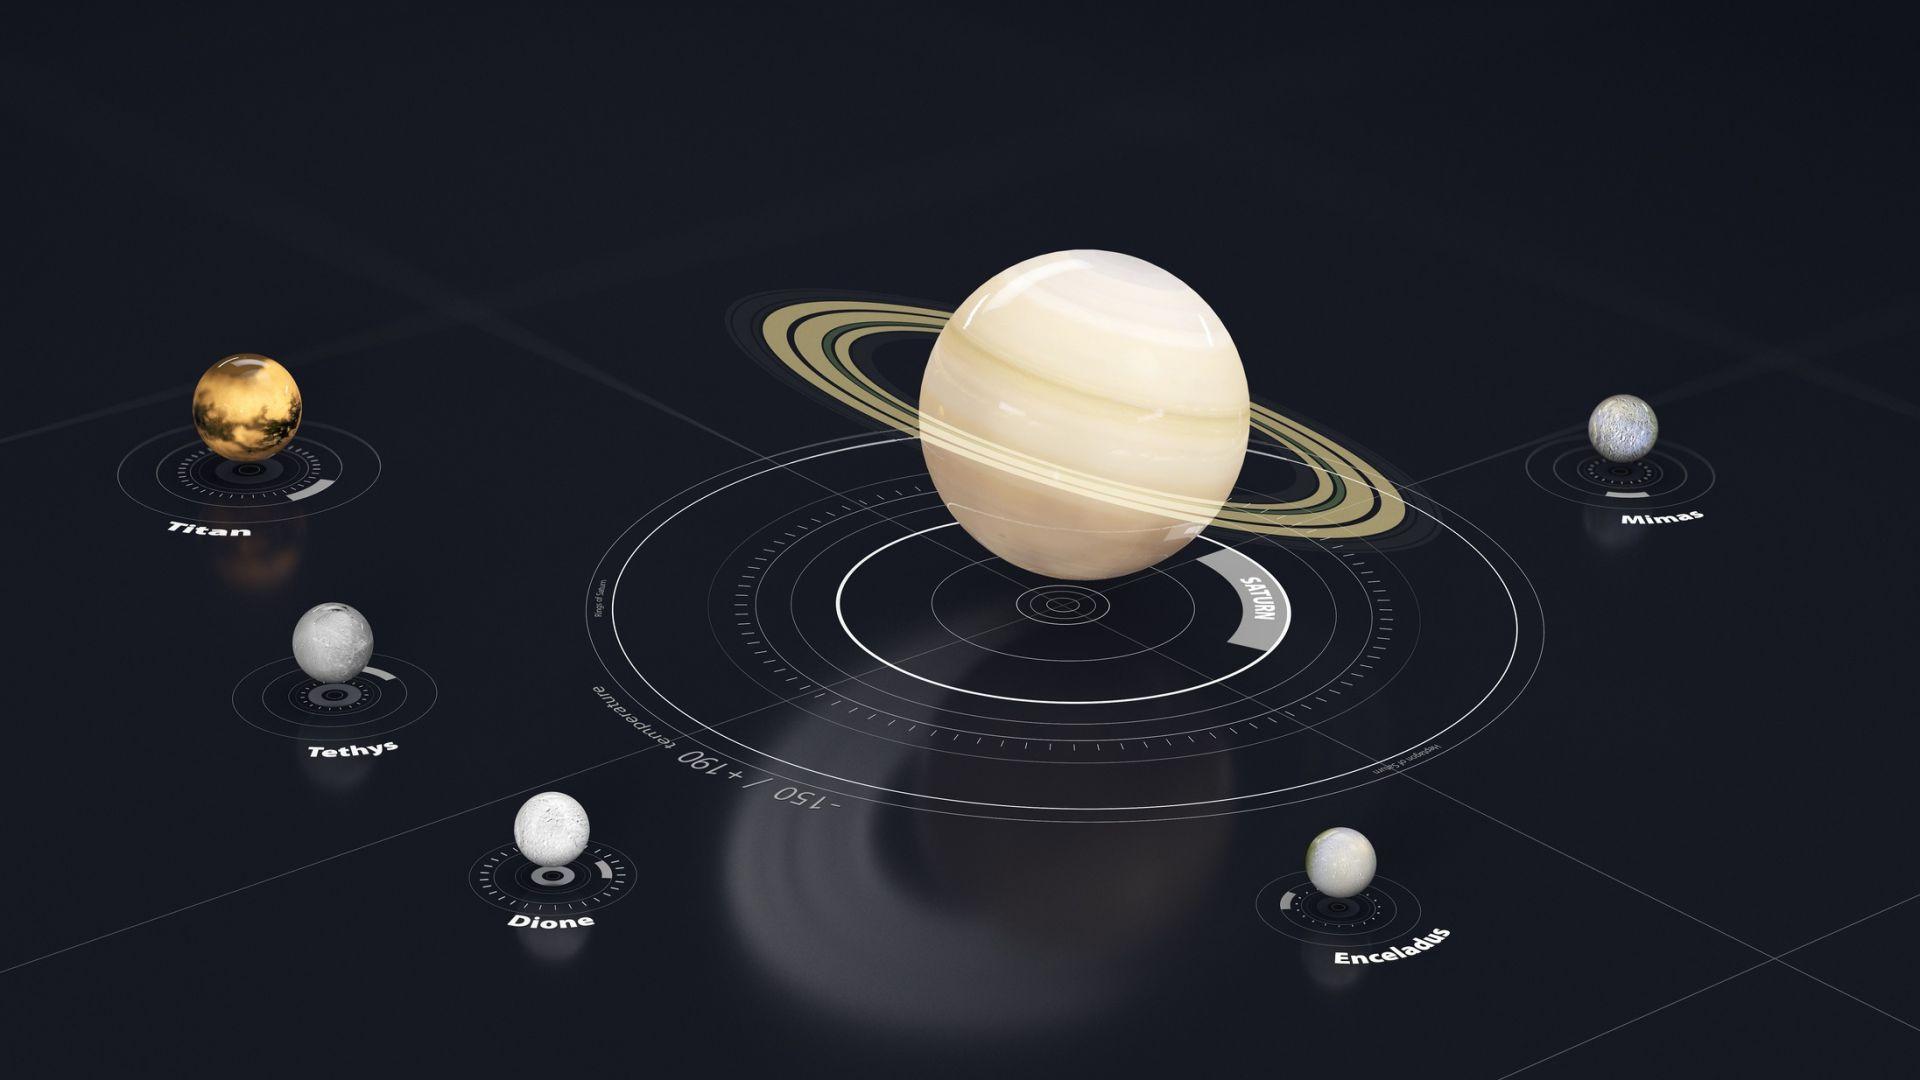 Сатурн стана шампион по луни, изпреварвайки Юпитер